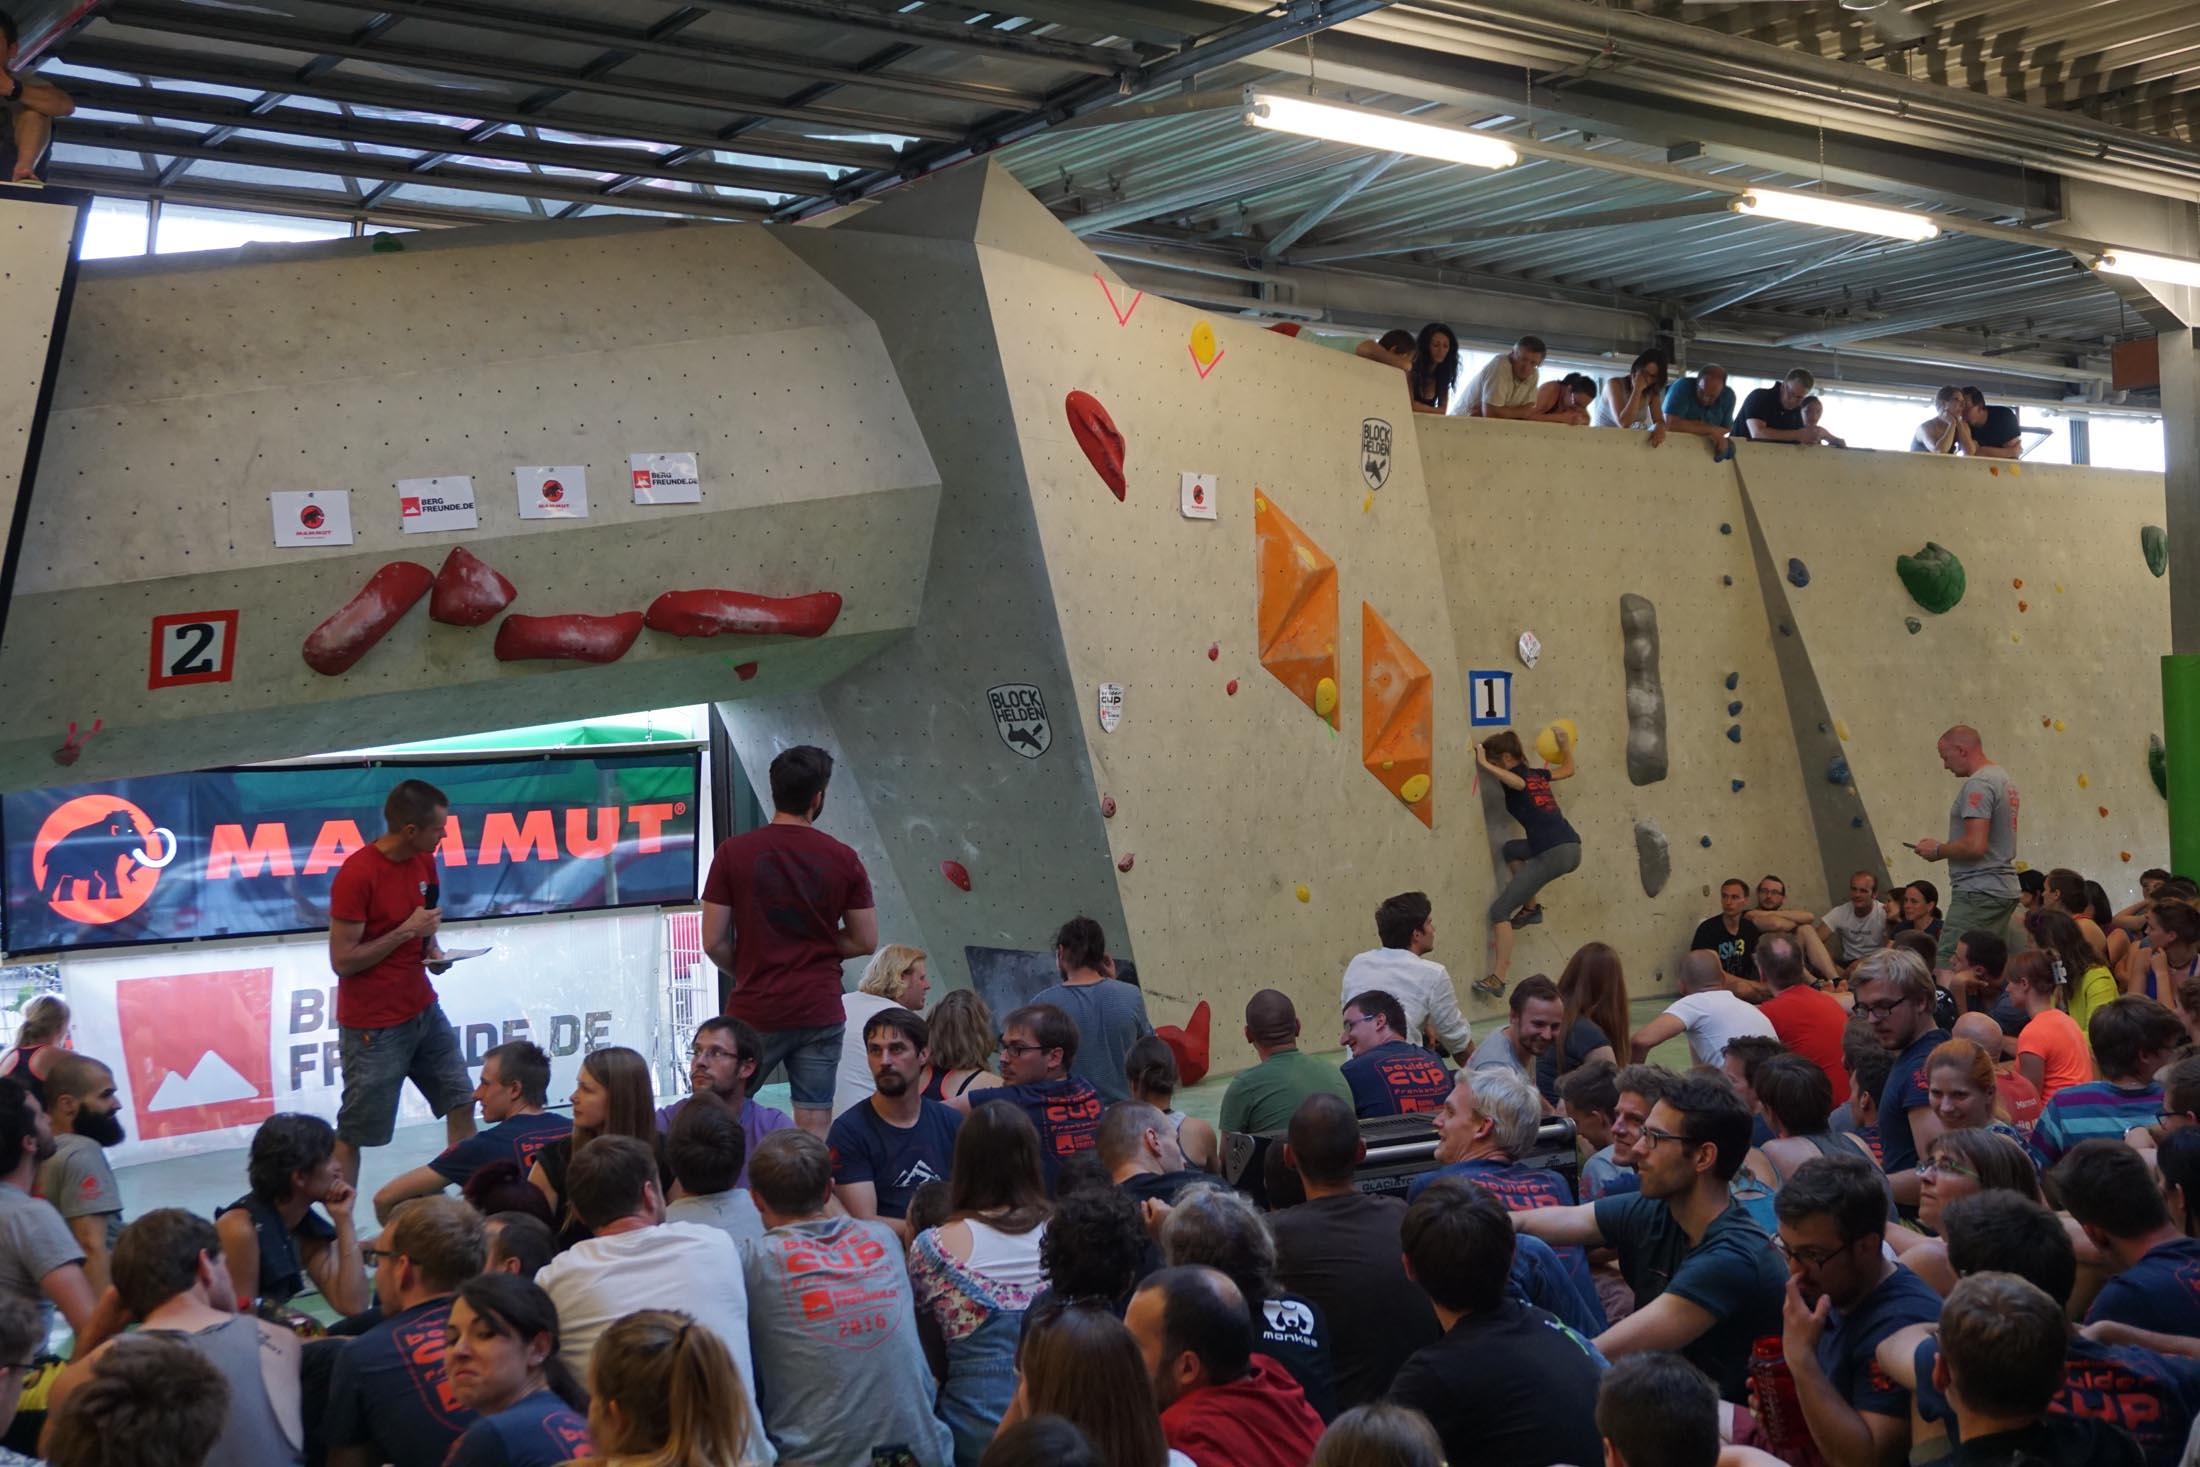 Finale, internationaler bouldercup Frankenjura 2016, BLOCKHELDEN Erlangen, Mammut, Bergfreunde.de, Boulderwettkampf07092016576